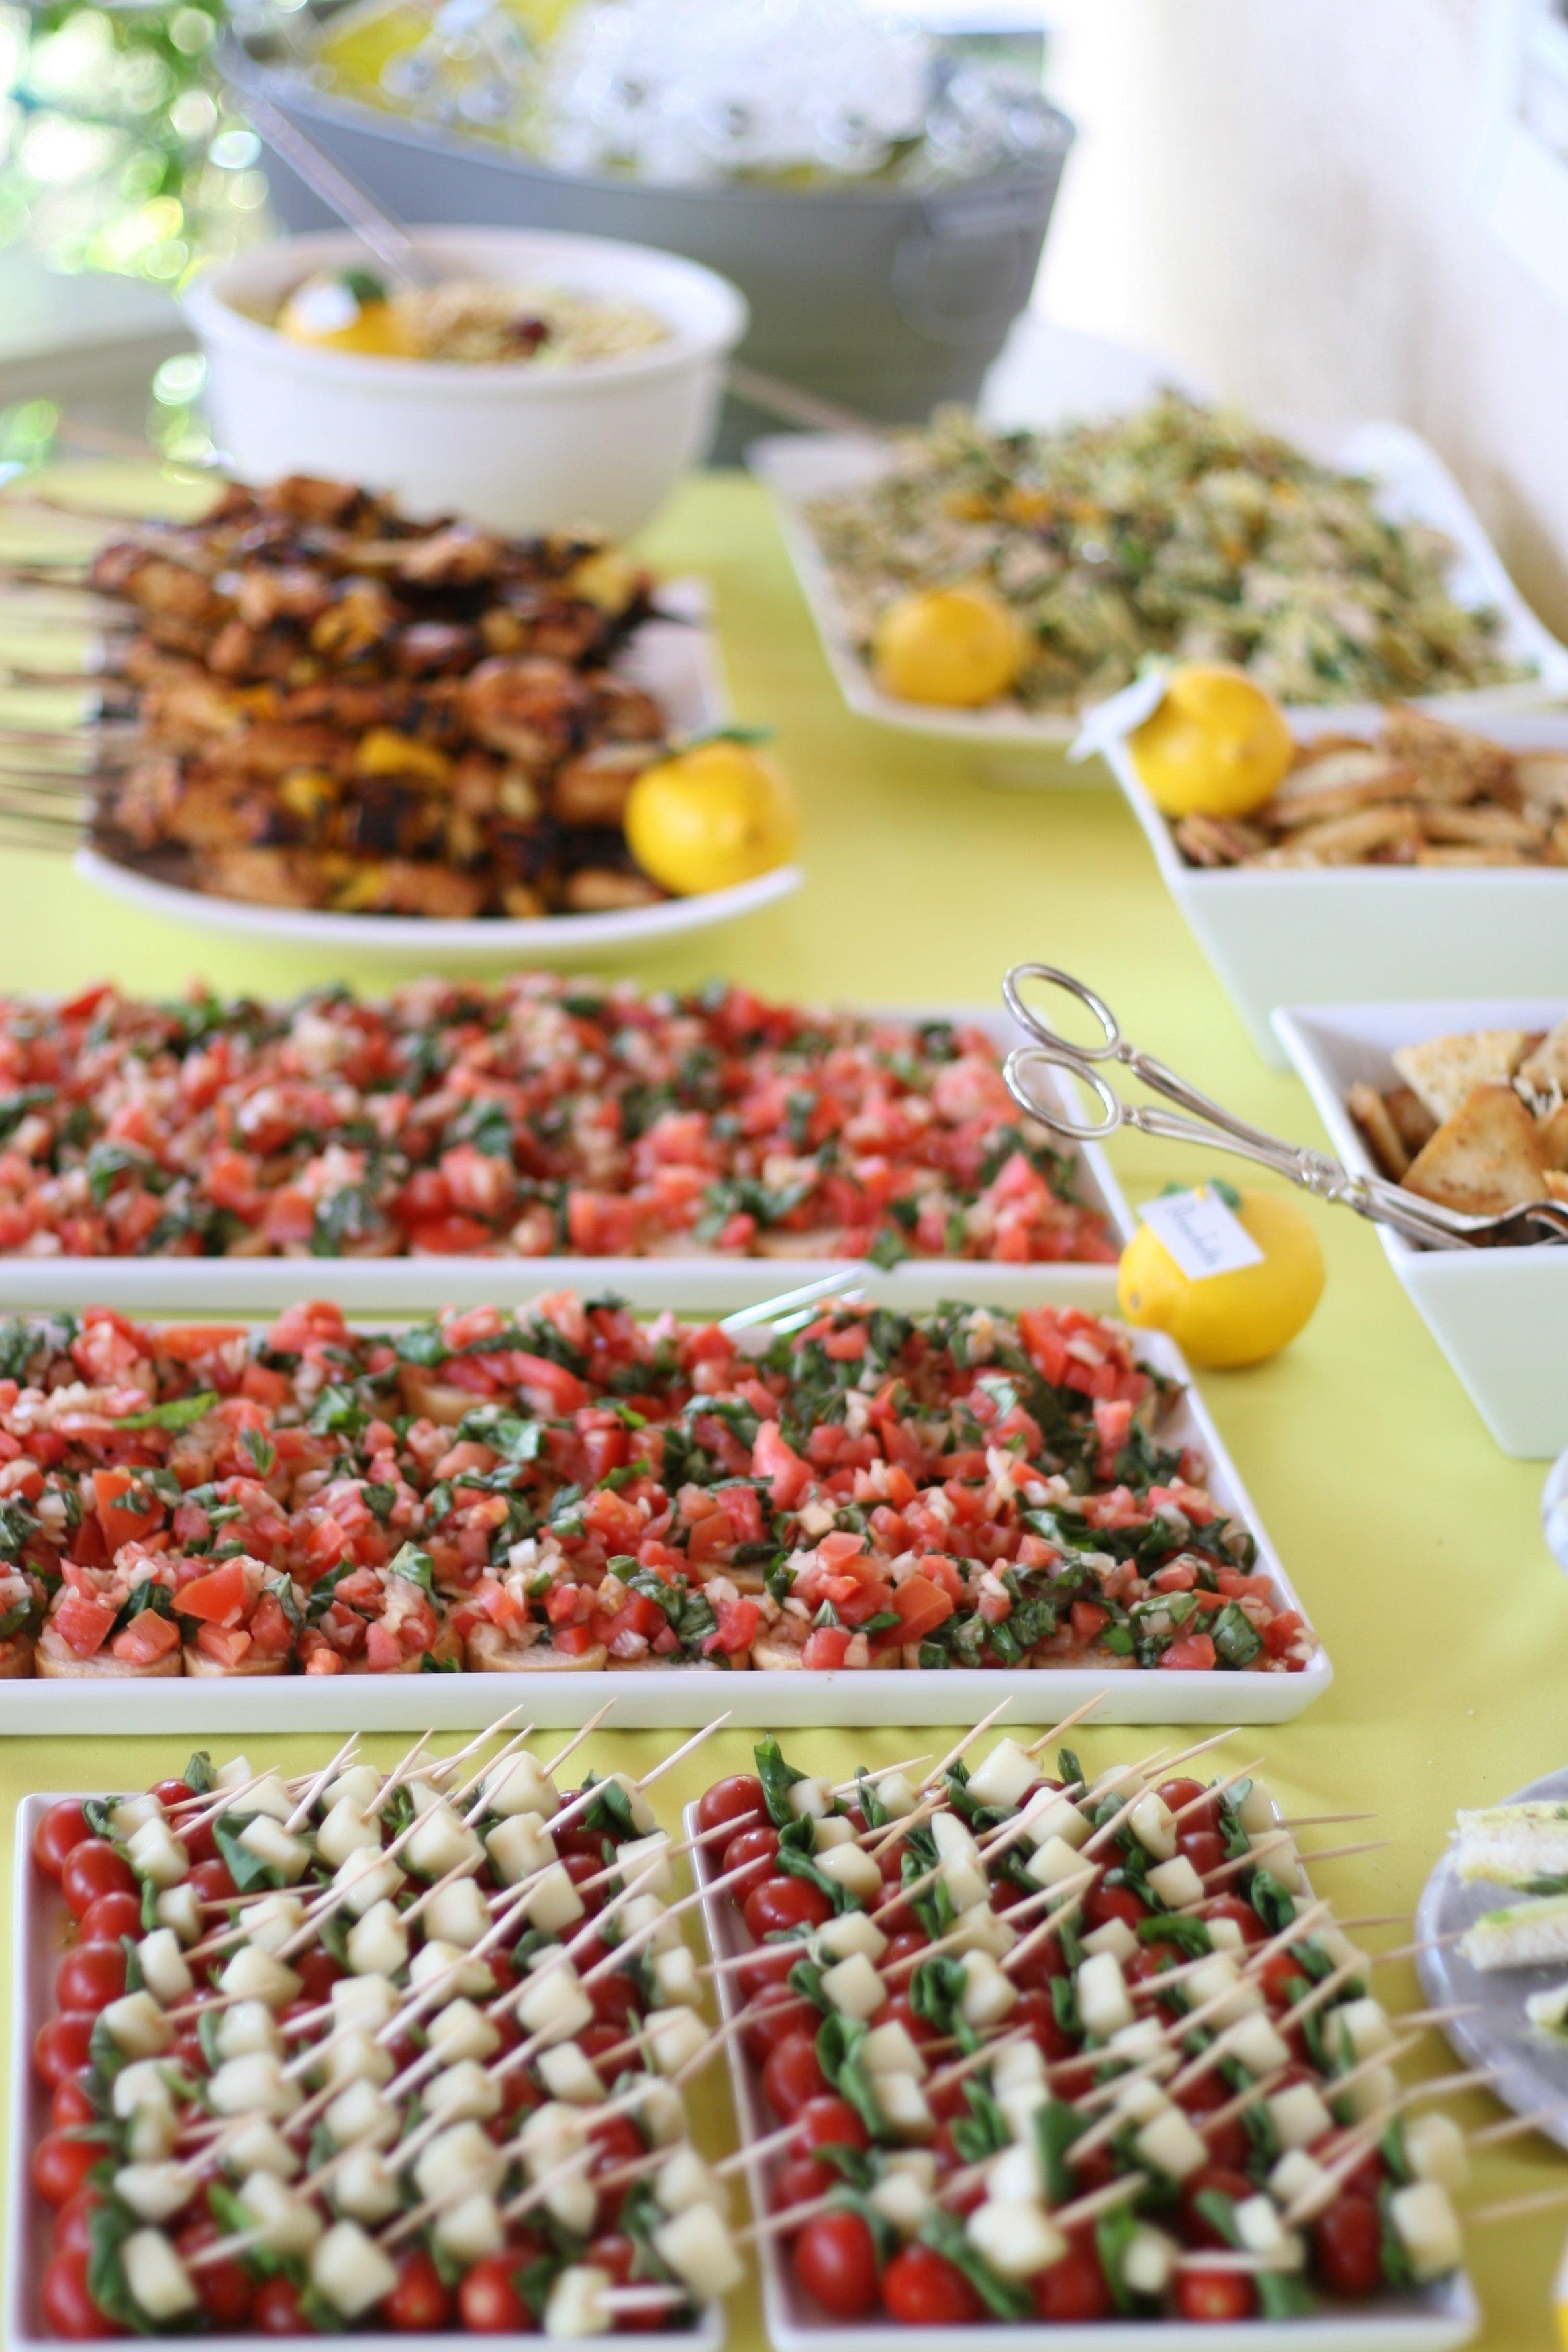 10 Lovable Bridal Shower Food Ideas Easy photo bridal shower food theme image 1 2021